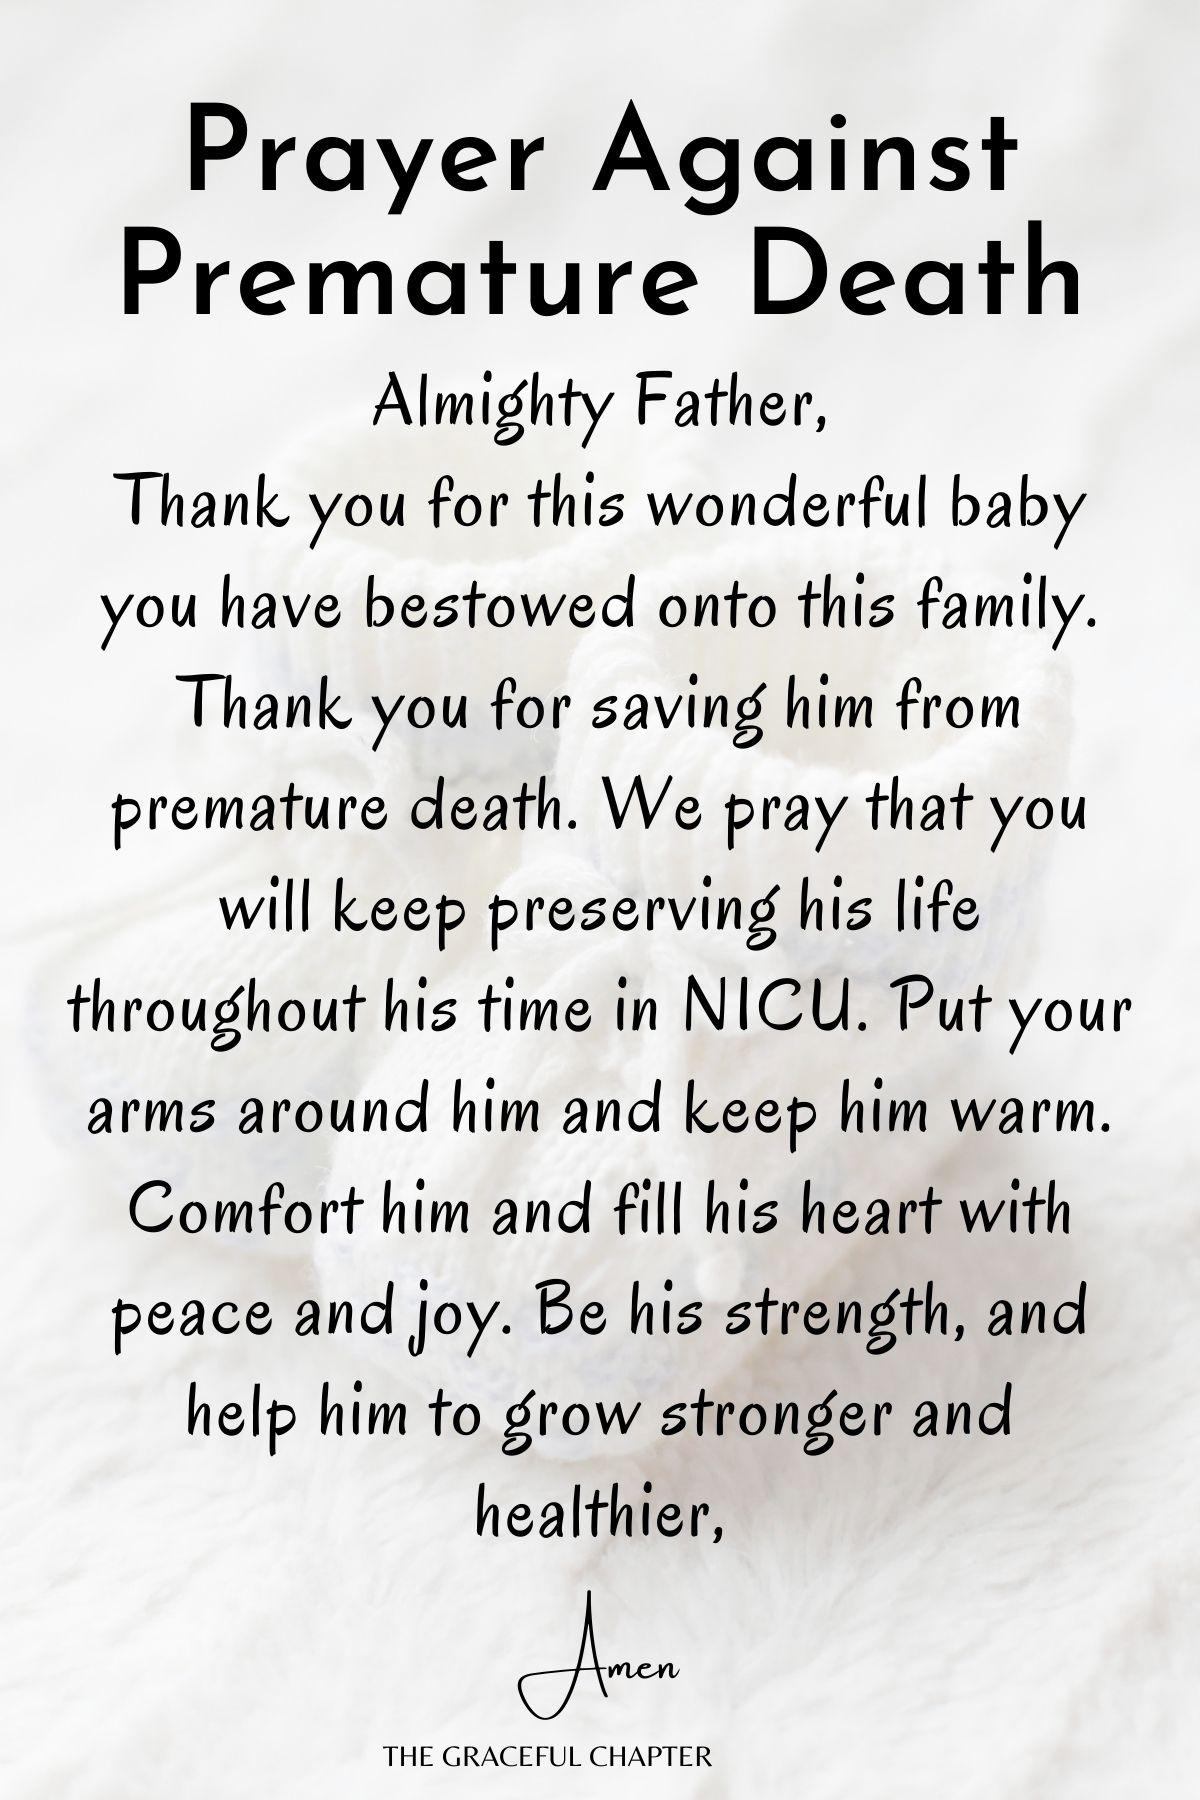 Prayer against premature death